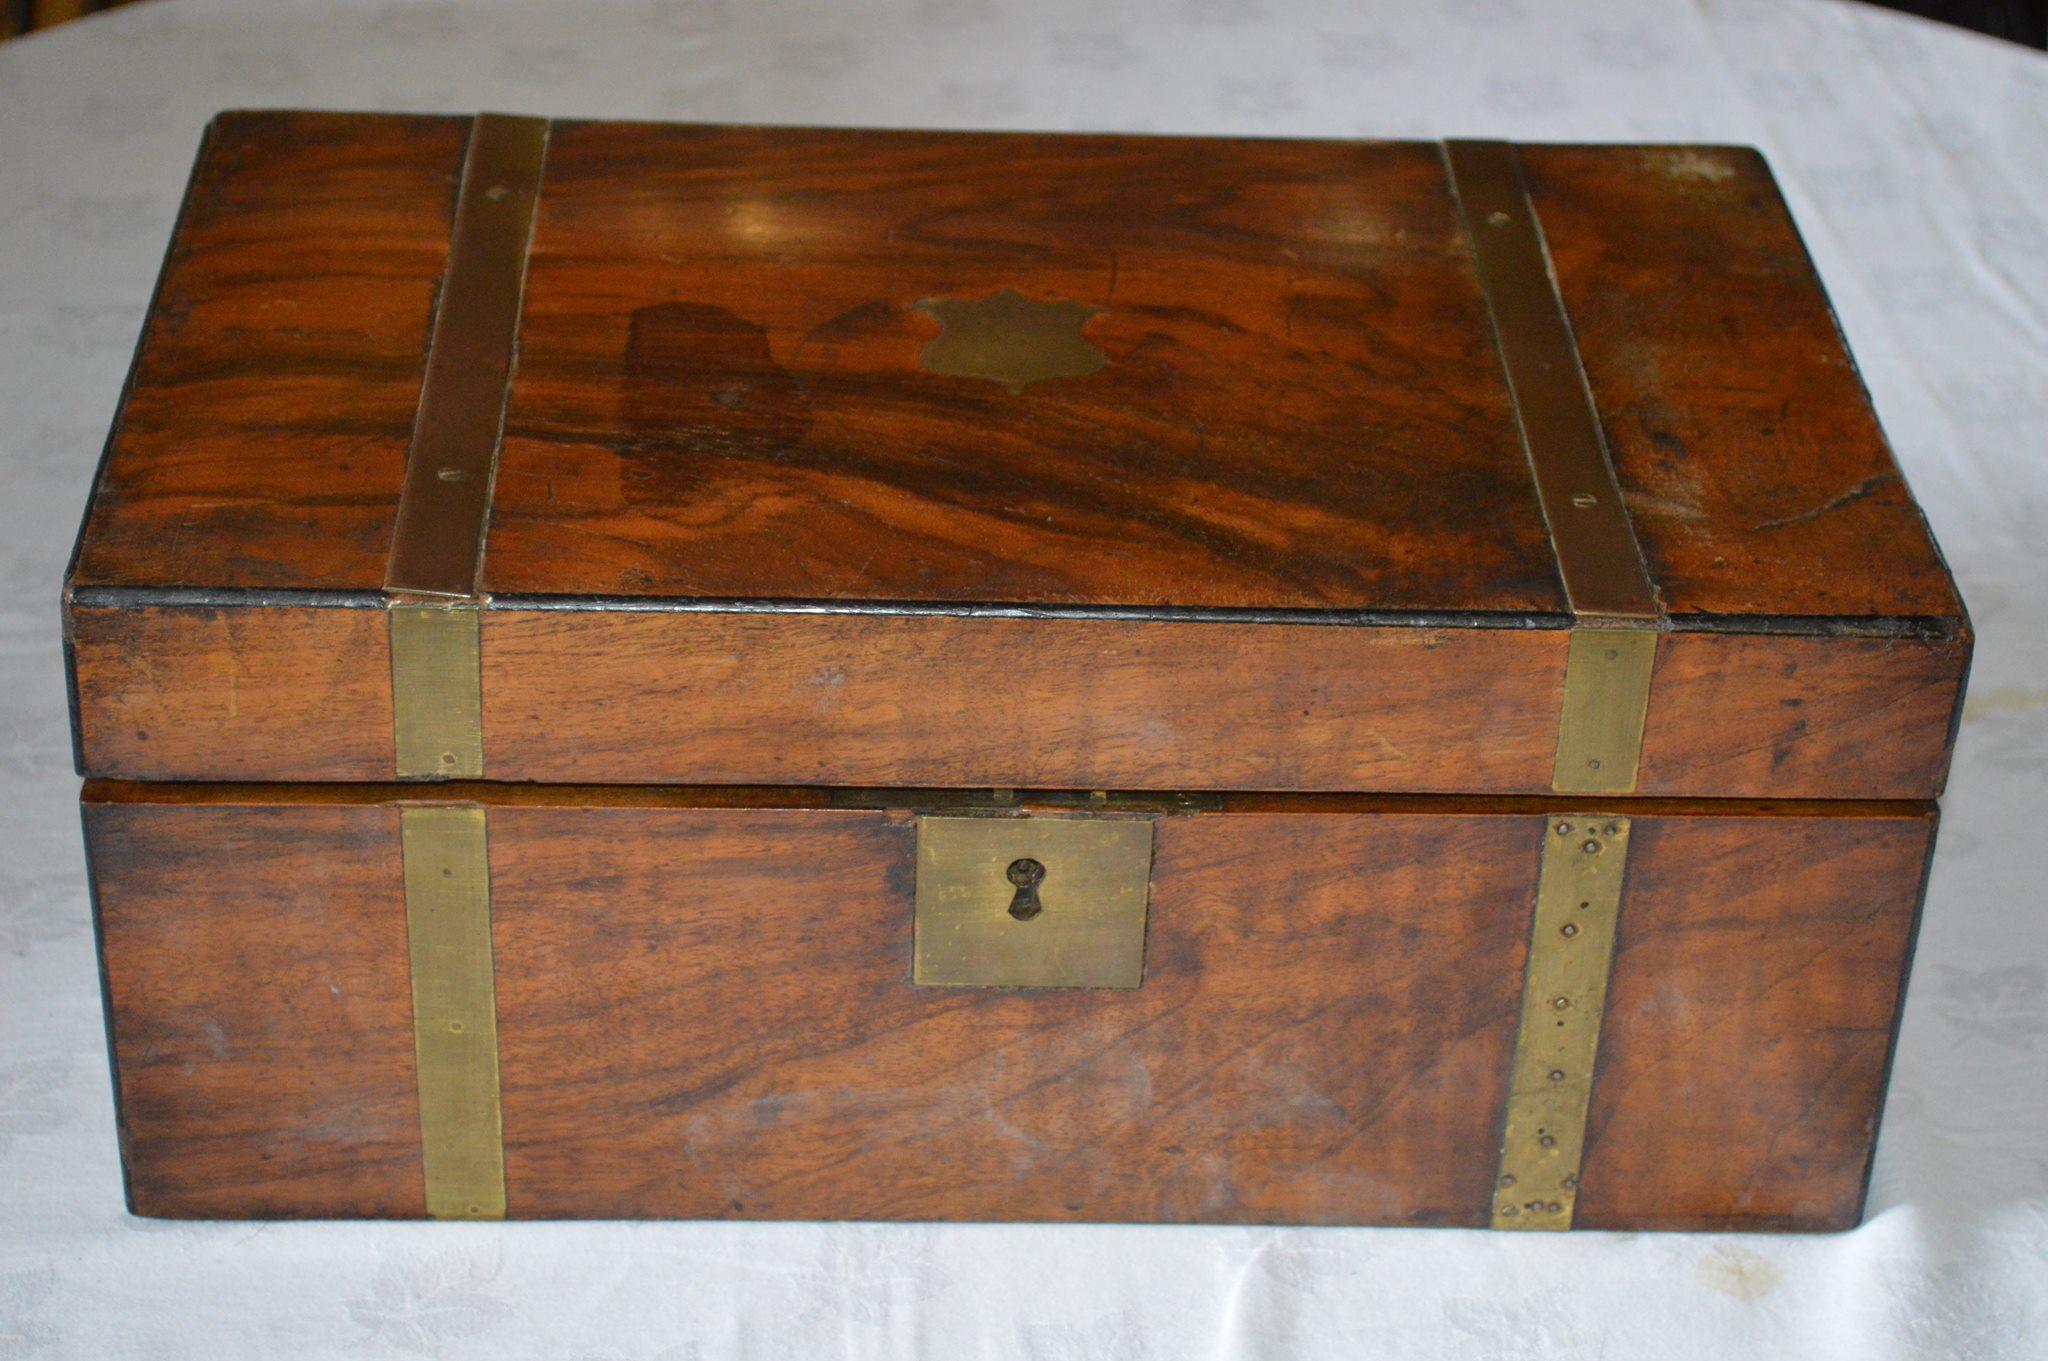 Image of antique box